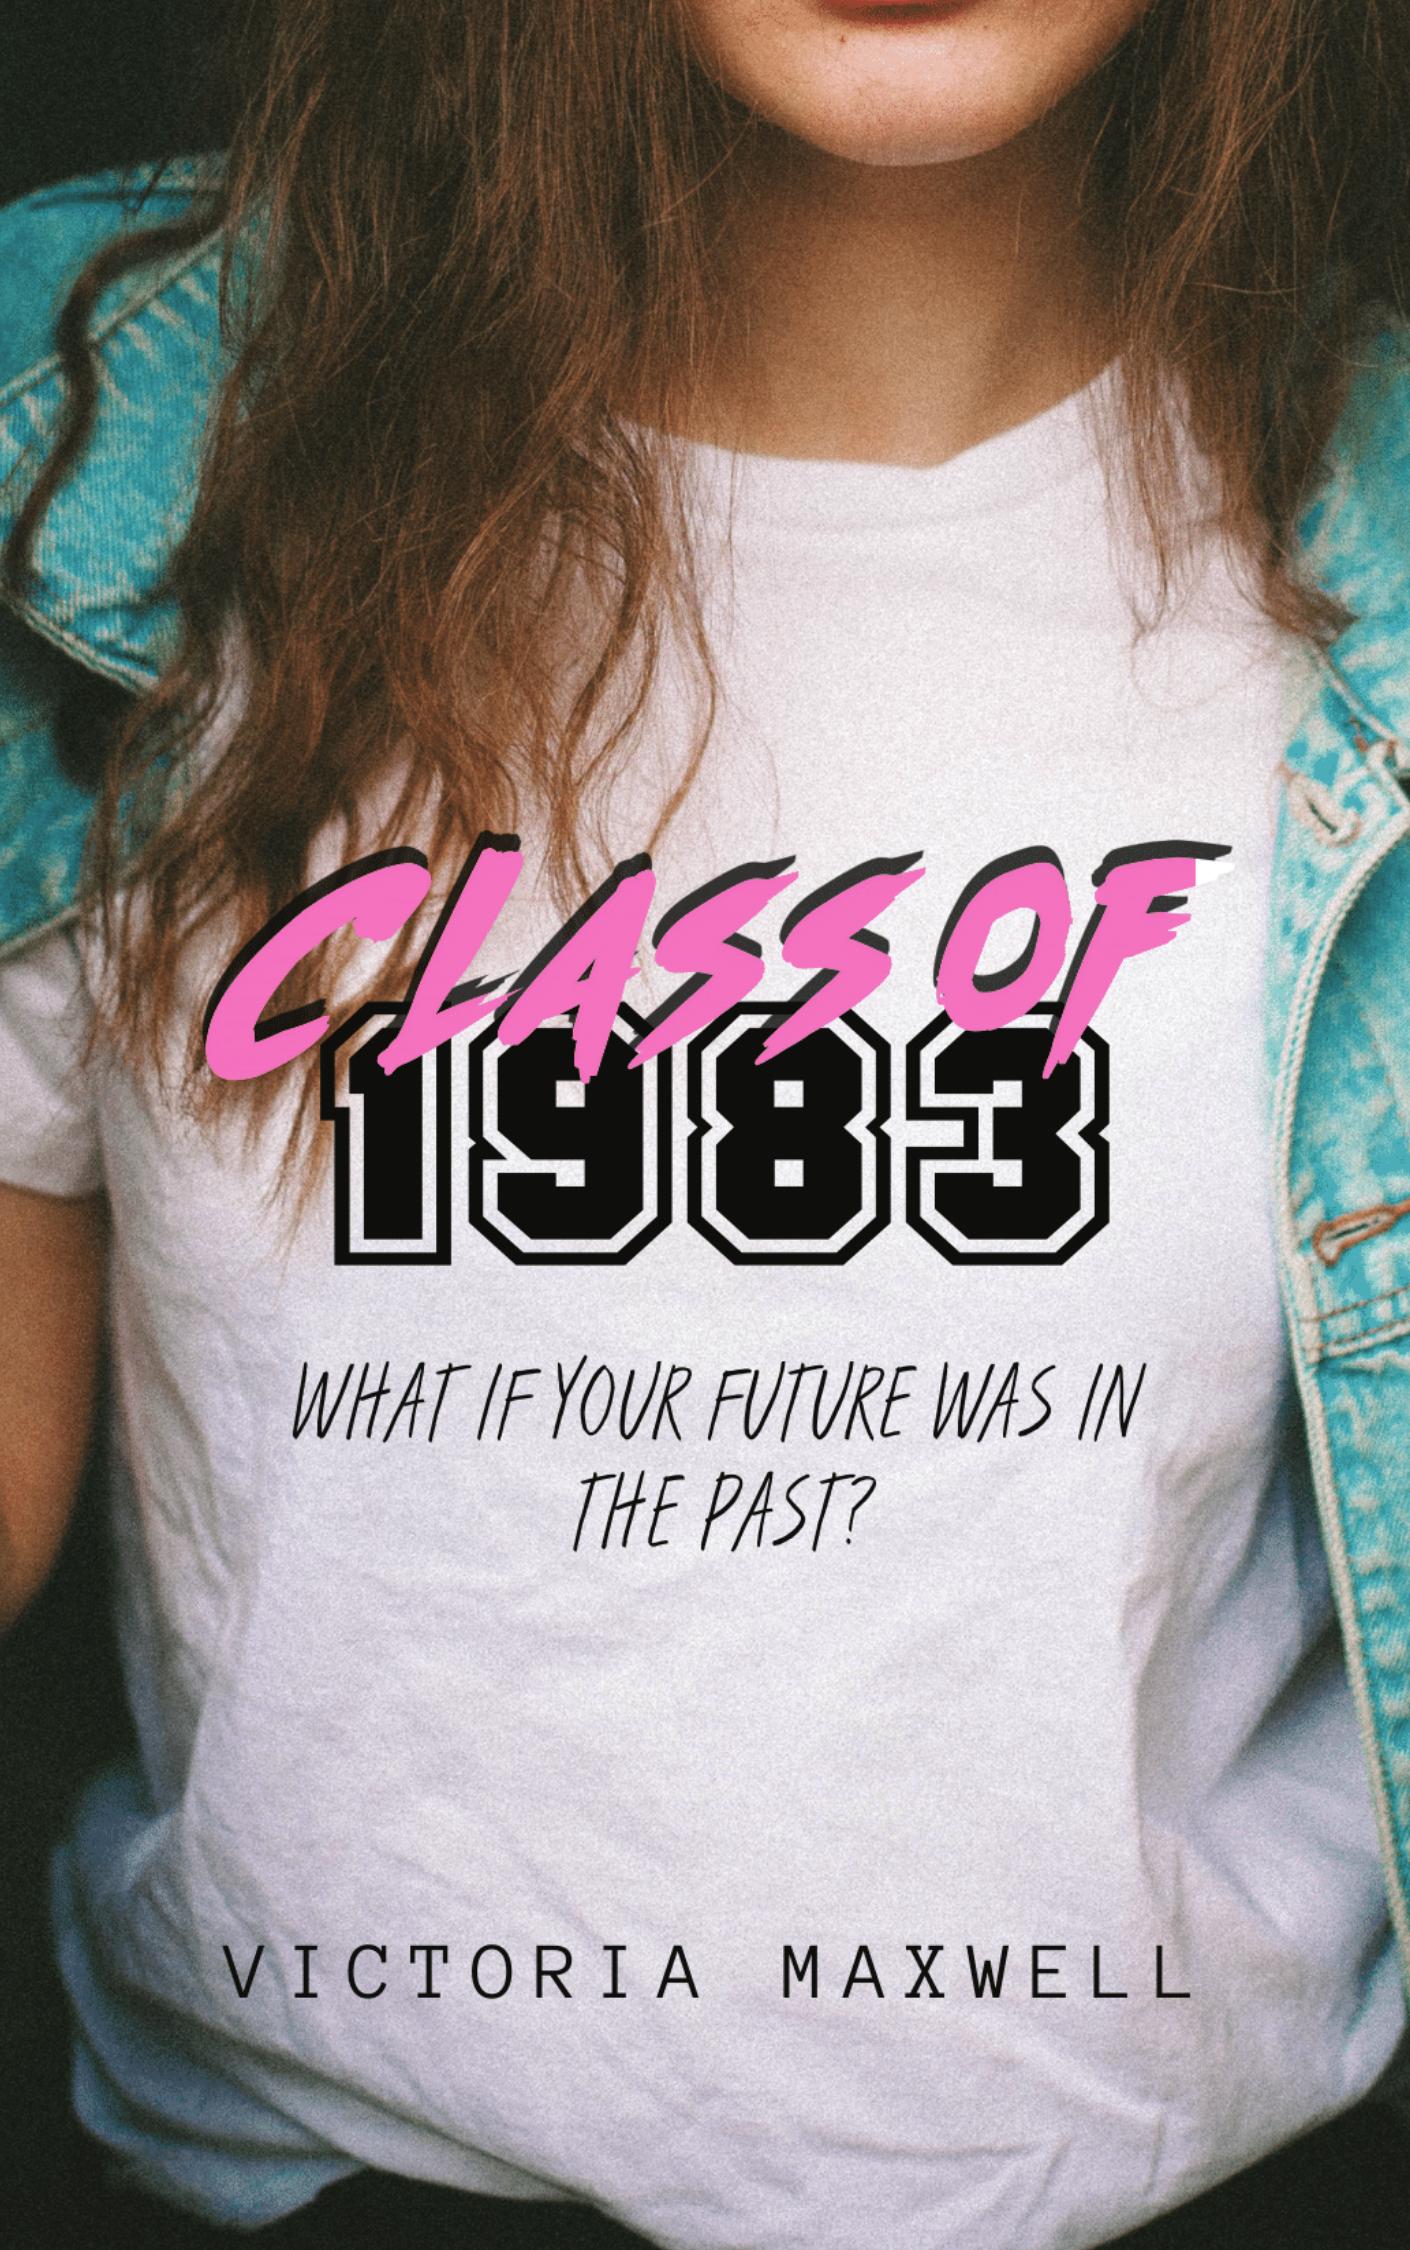 Class of 1983 book Victoria Maxwell